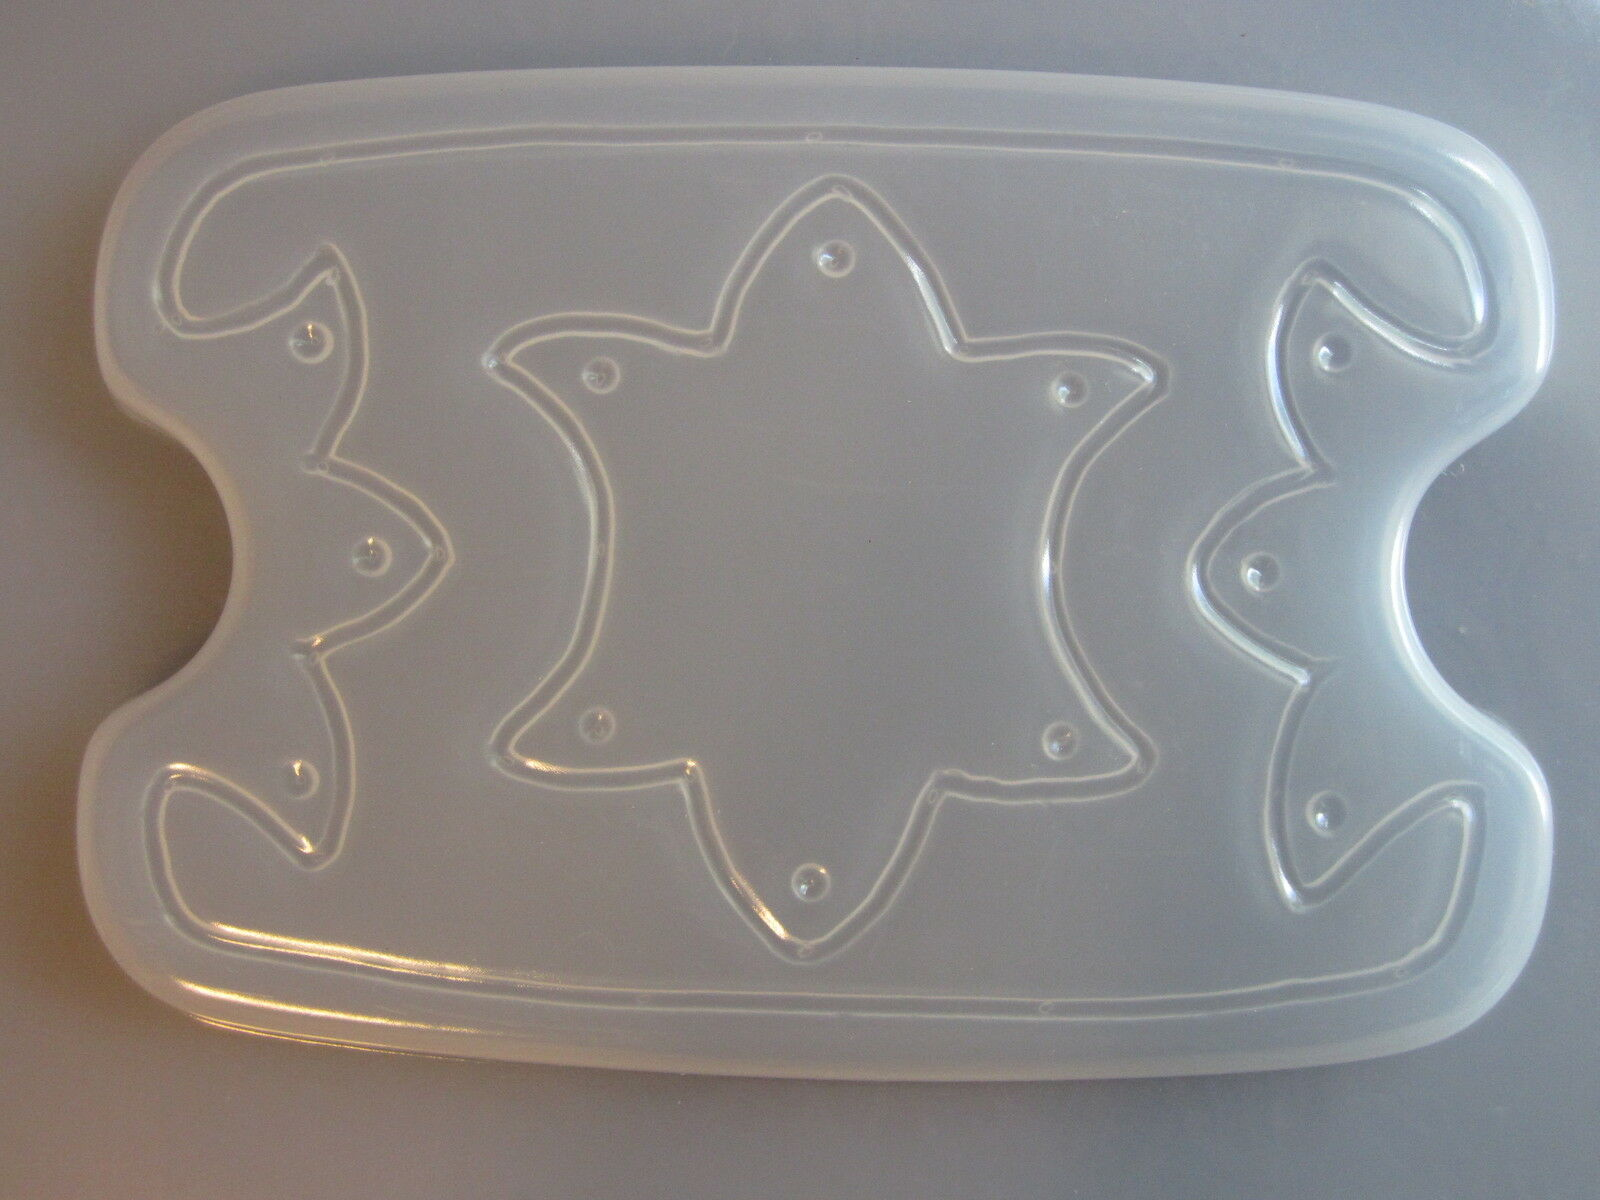 Resin Mold Jewelry Box & Lid Set Star 6x4.5 15x11,5cm Gift Trinket Or Soap Dish